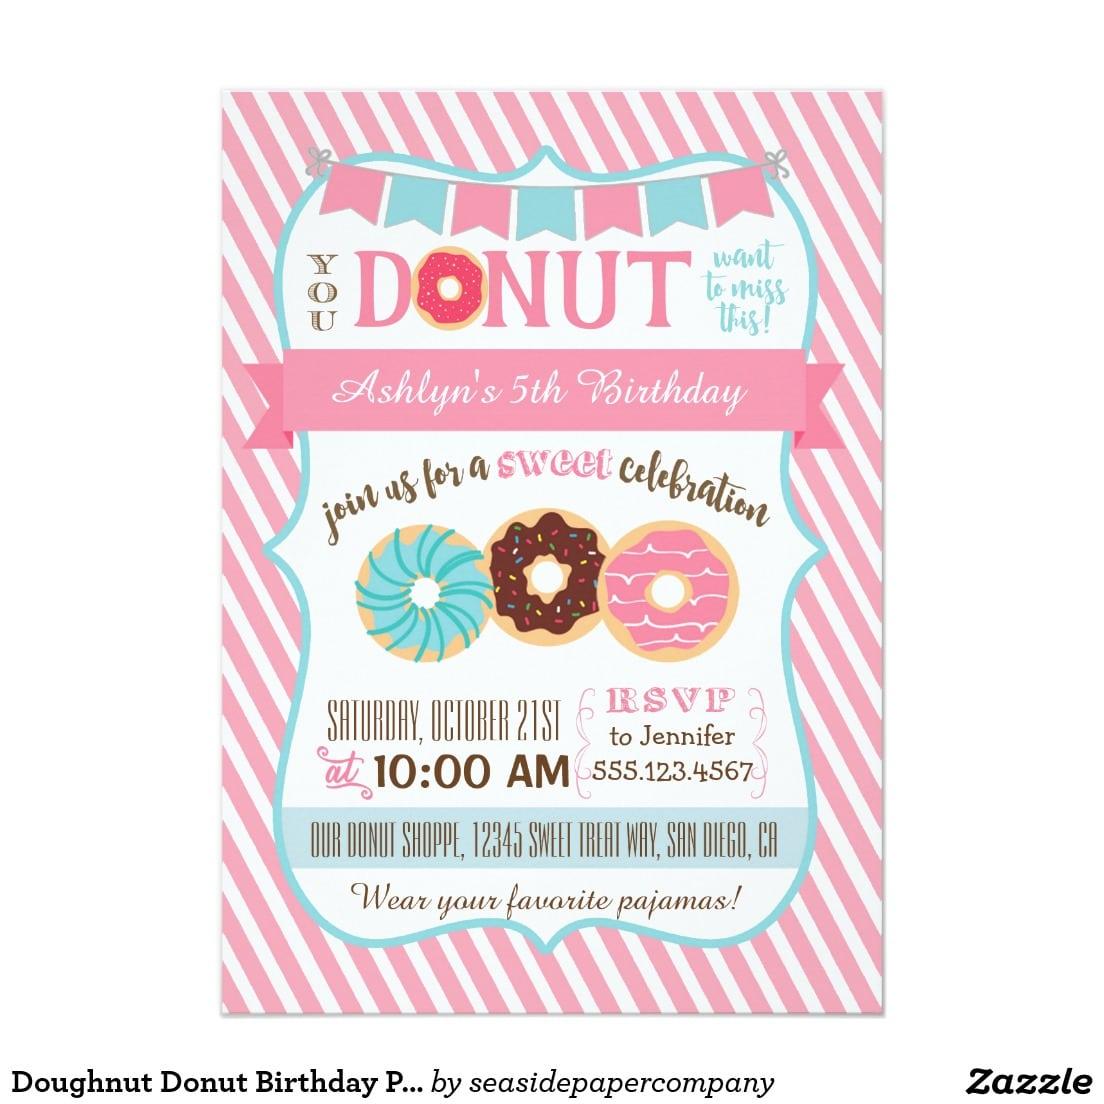 Doughnut Donut Birthday Party Invitation Pink Girl